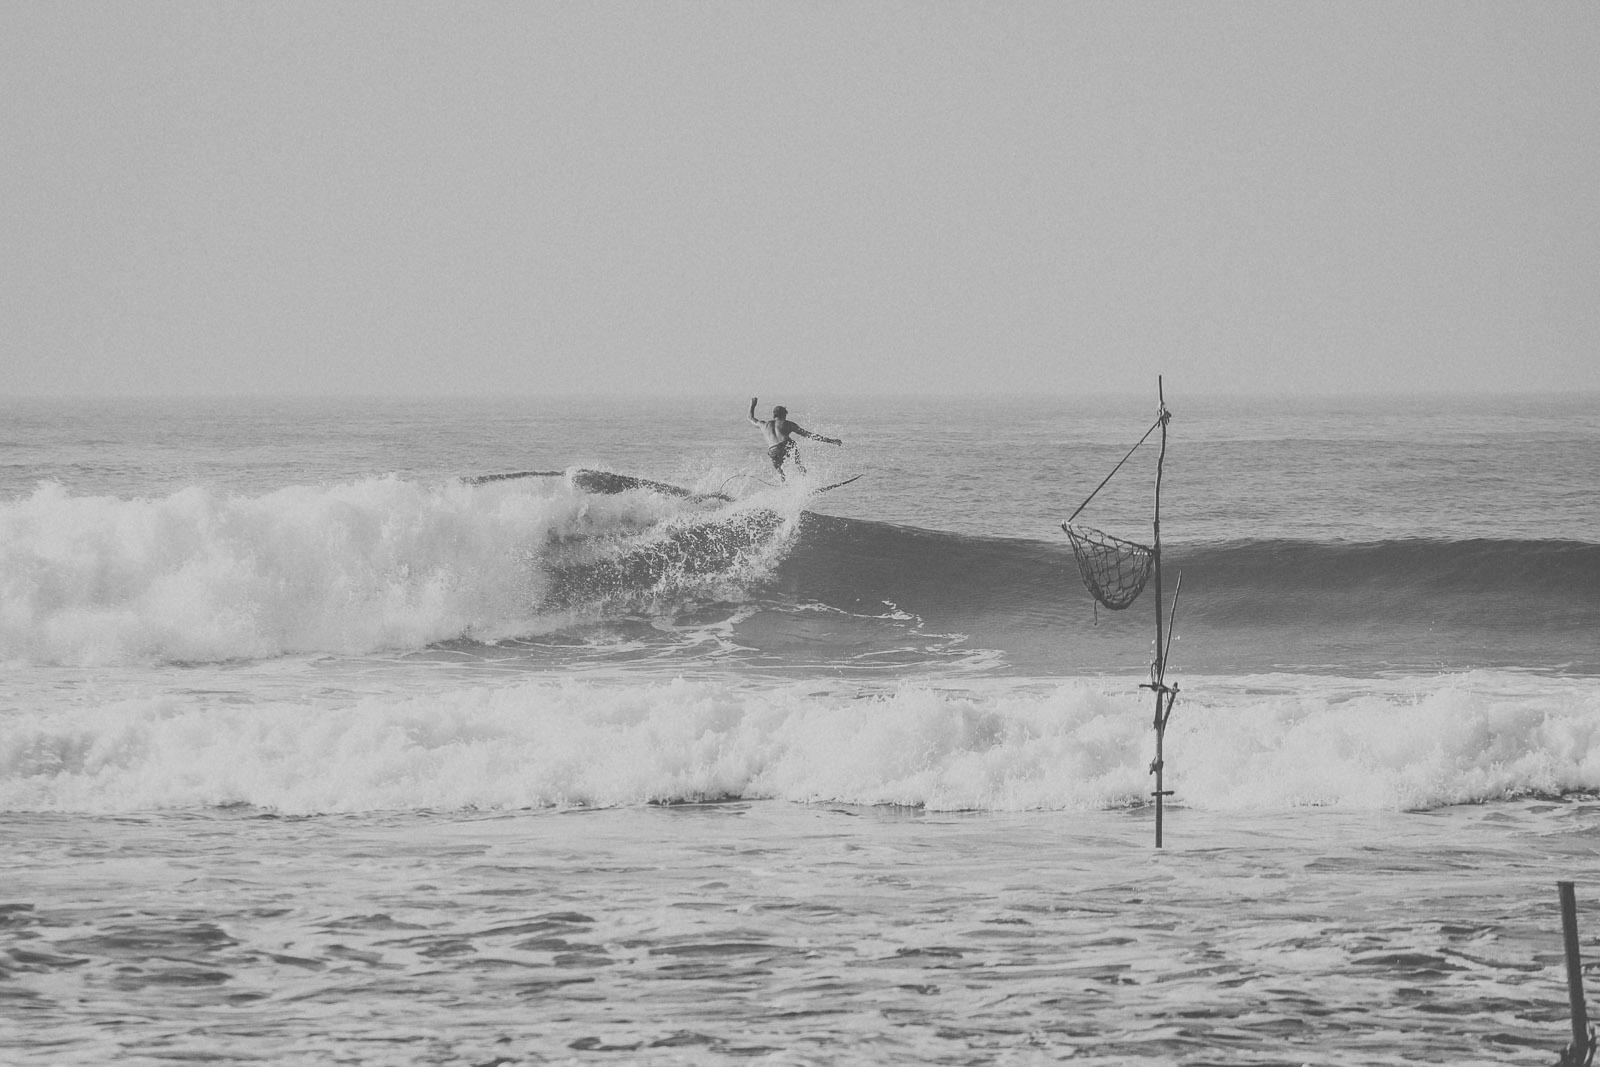 Sri Lanka-Ahangama-Kabalana-The rock-Surf-Barrel-Big swell-Midigama-Surfing-travel-blog-IMG_8885